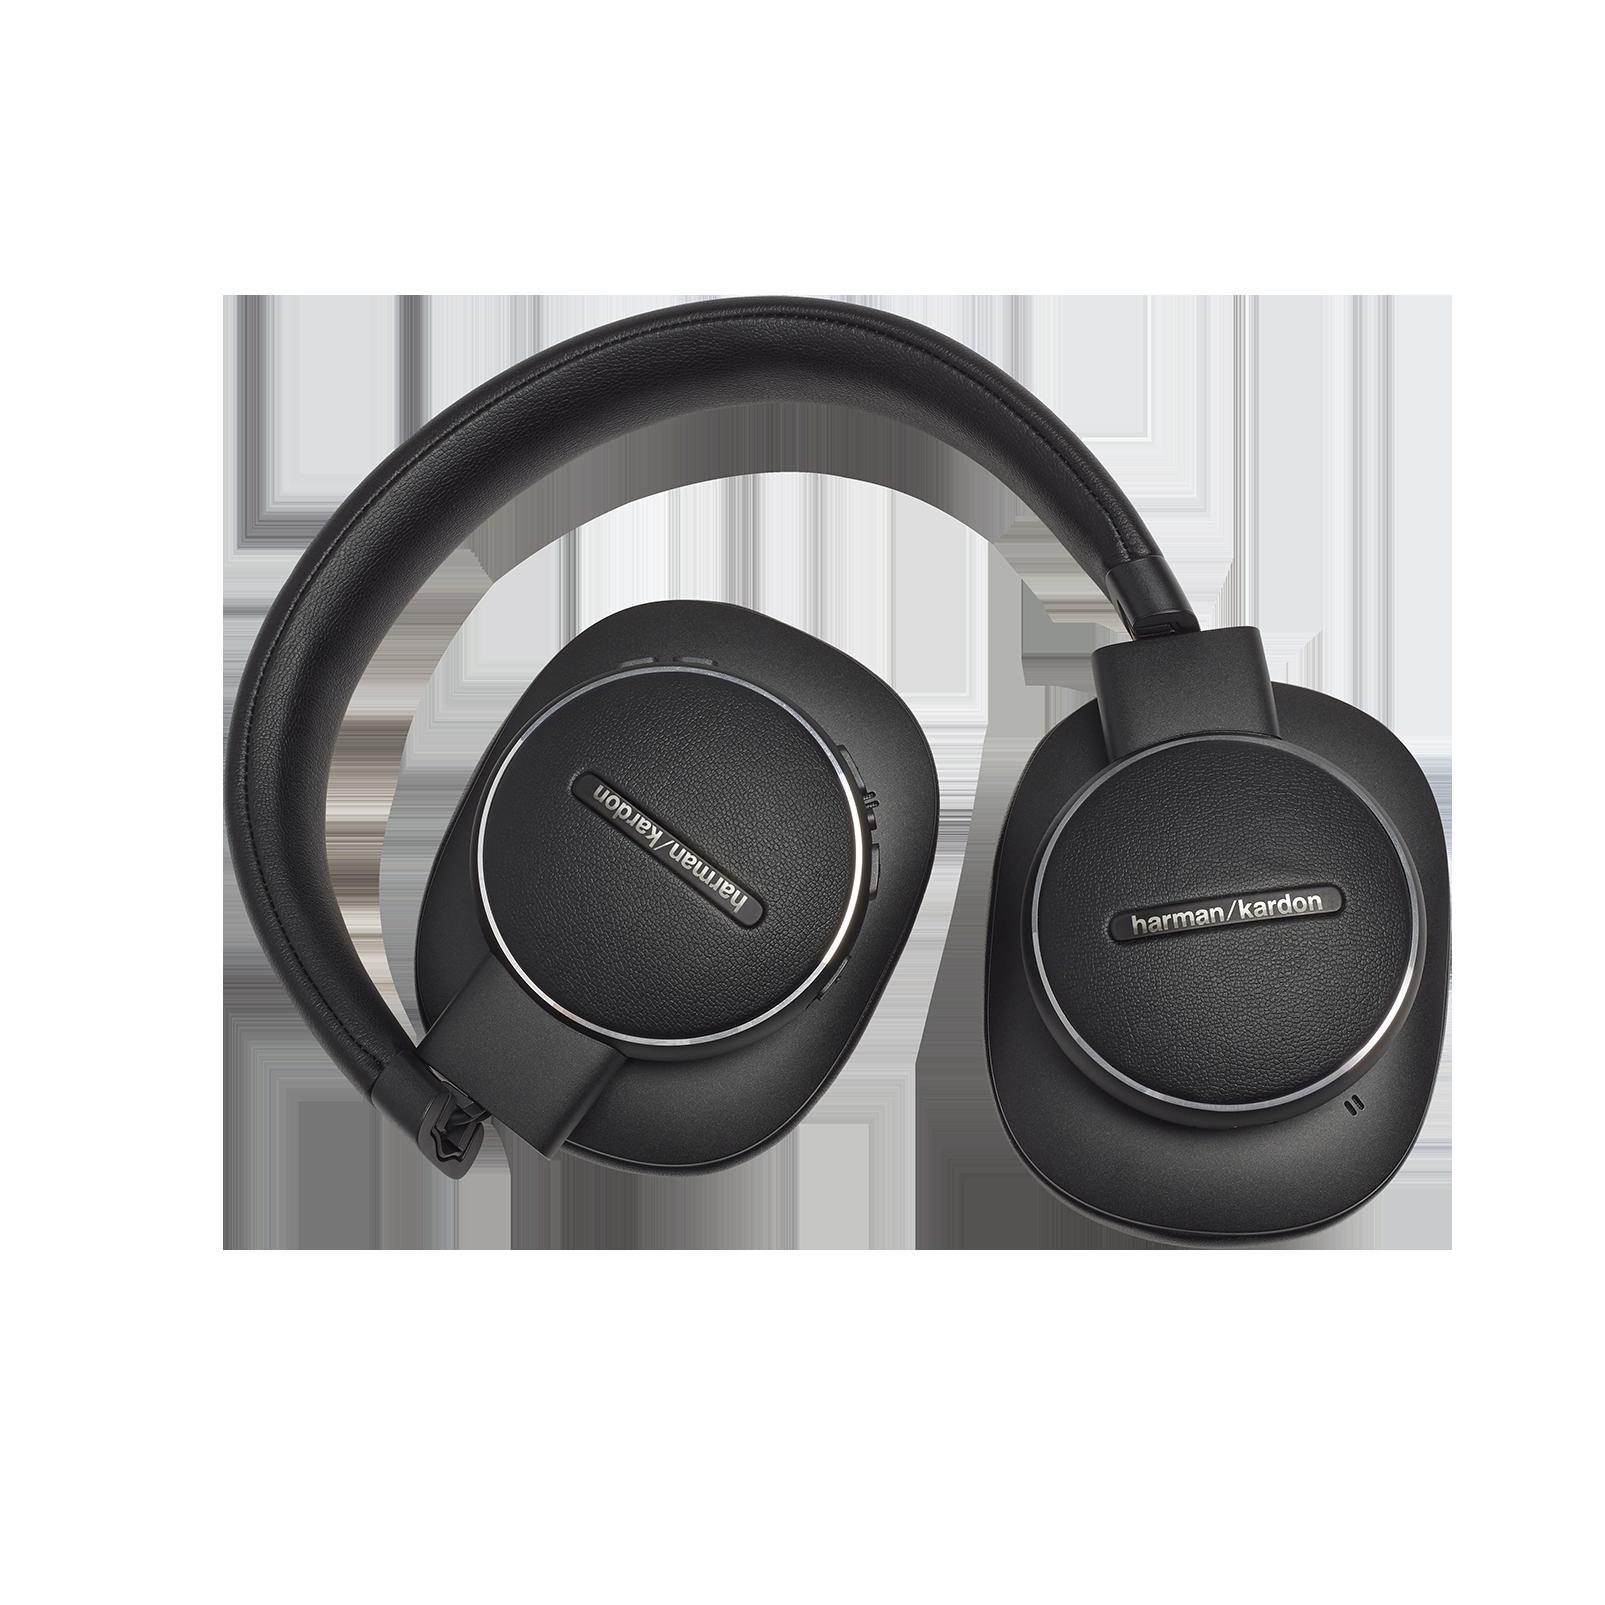 Harman Kardon FLY ANC - Black - Wireless Over-Ear NC Headphones - Detailshot 5